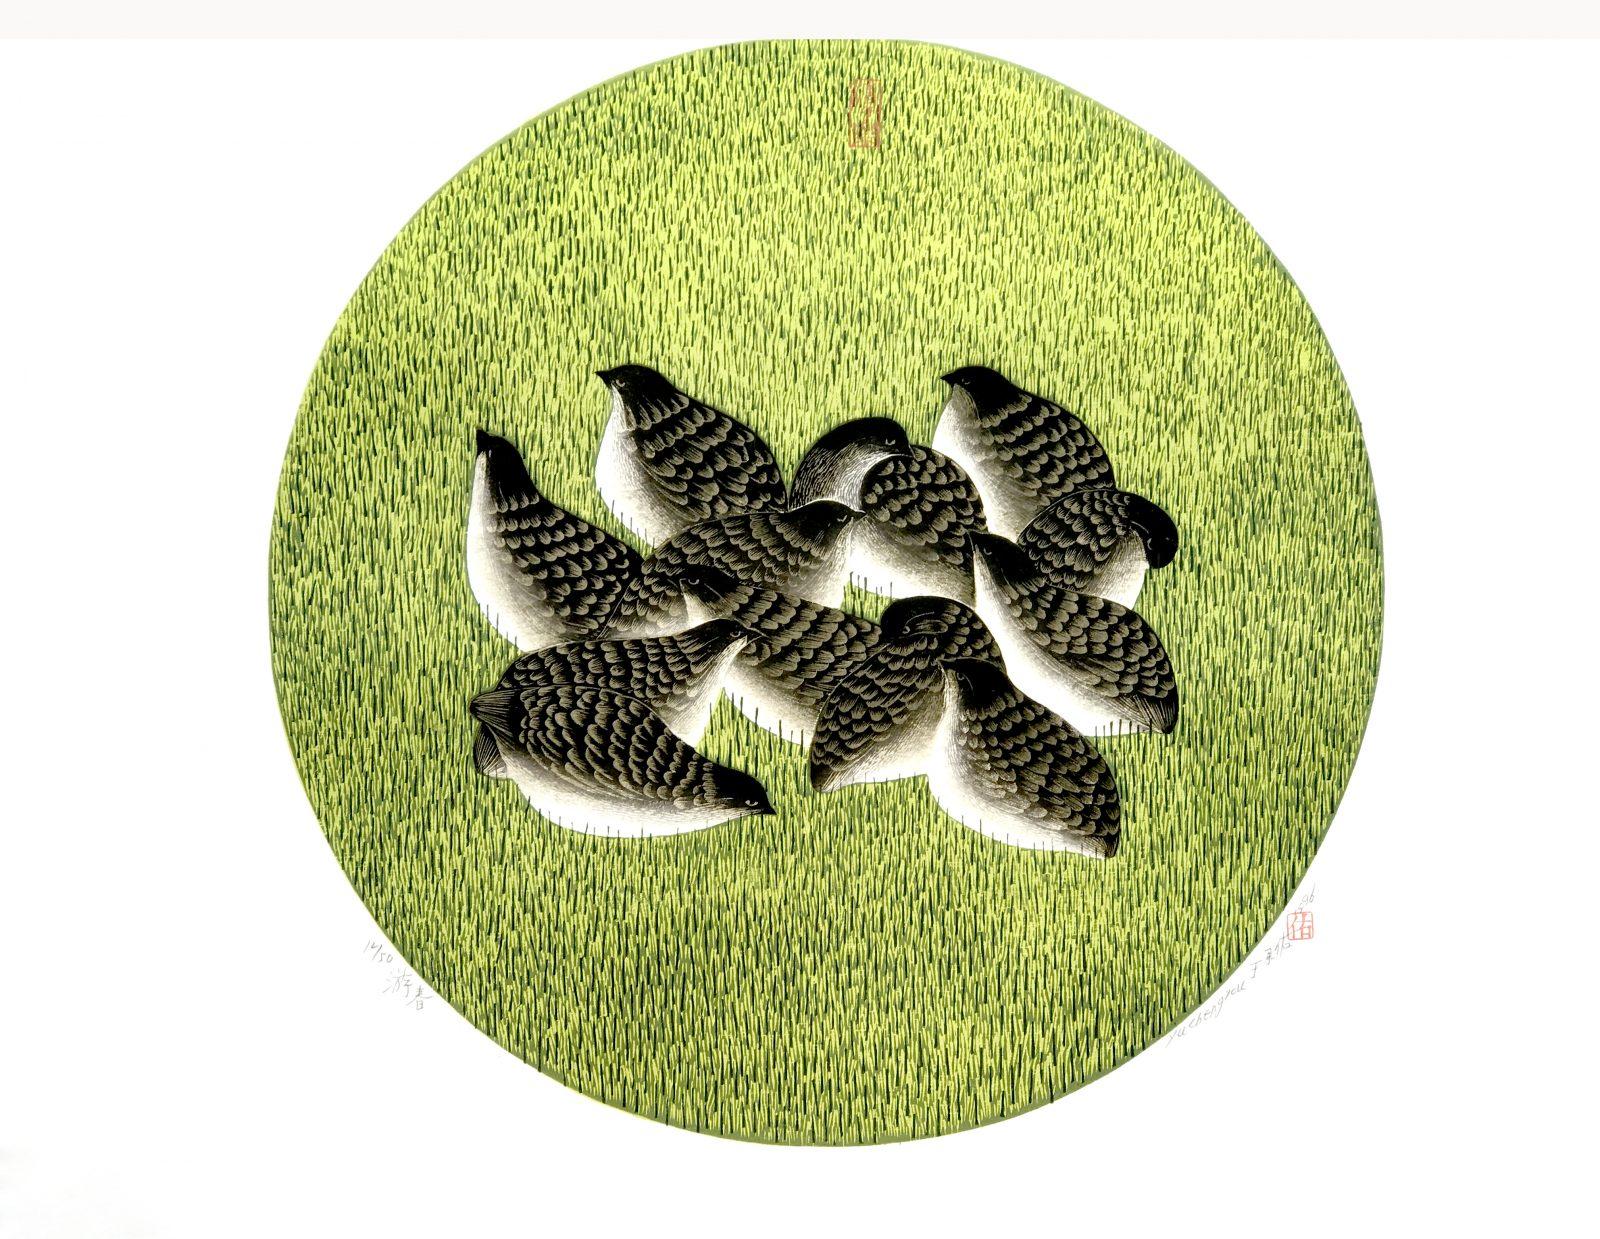 Spring Outing 12:50 by Yu Cehngyou,50.70cm Diameters